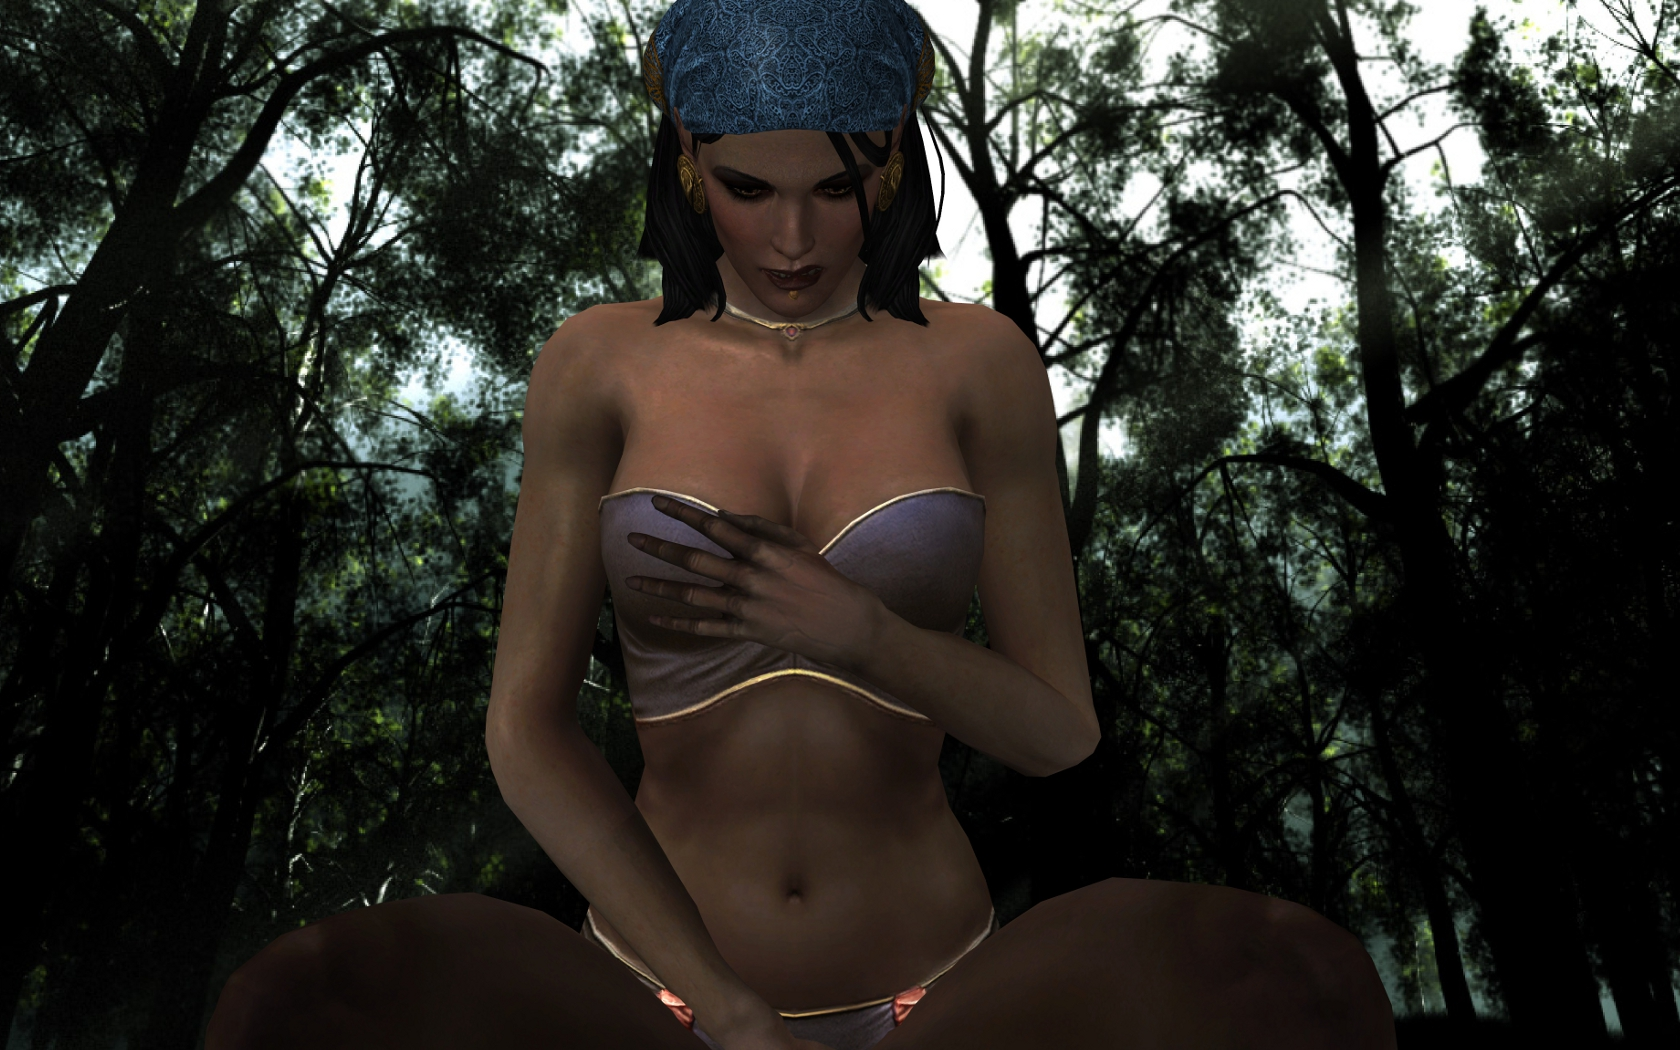 Dragon age 2 isabella nude mod adult scene